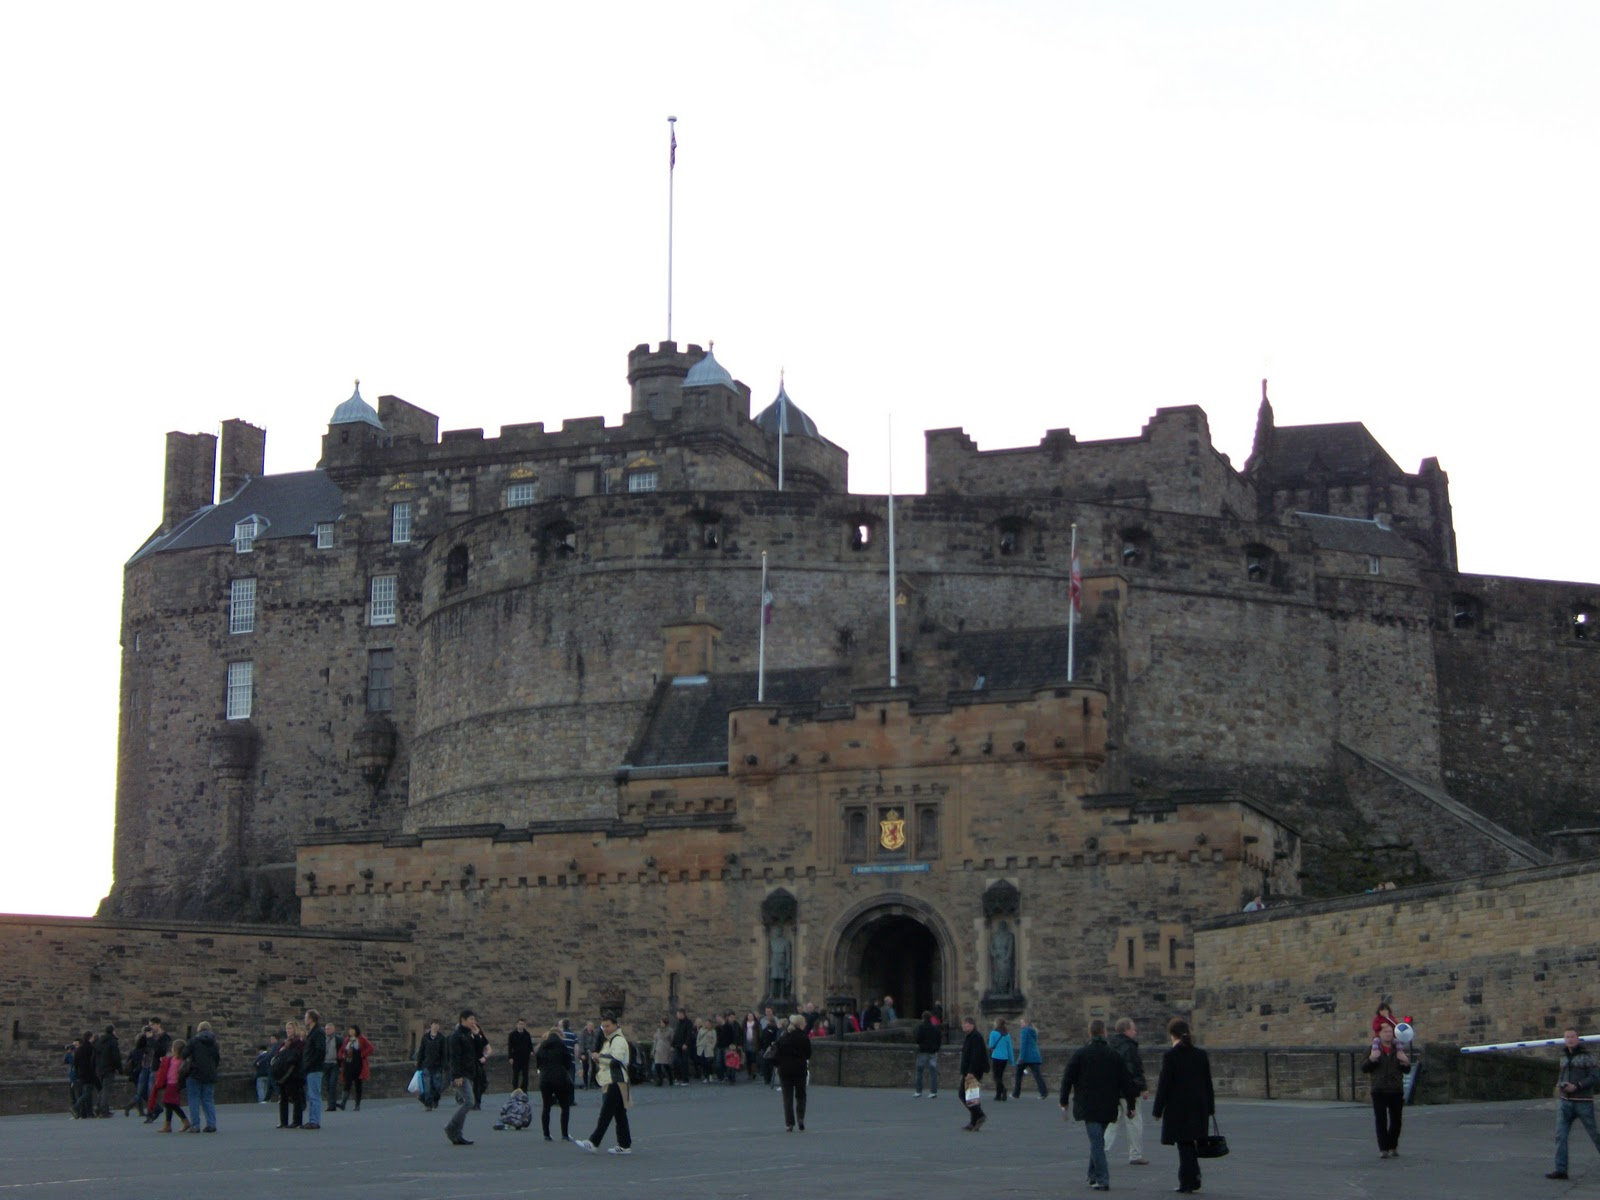 Edinburgh castle kilt shop